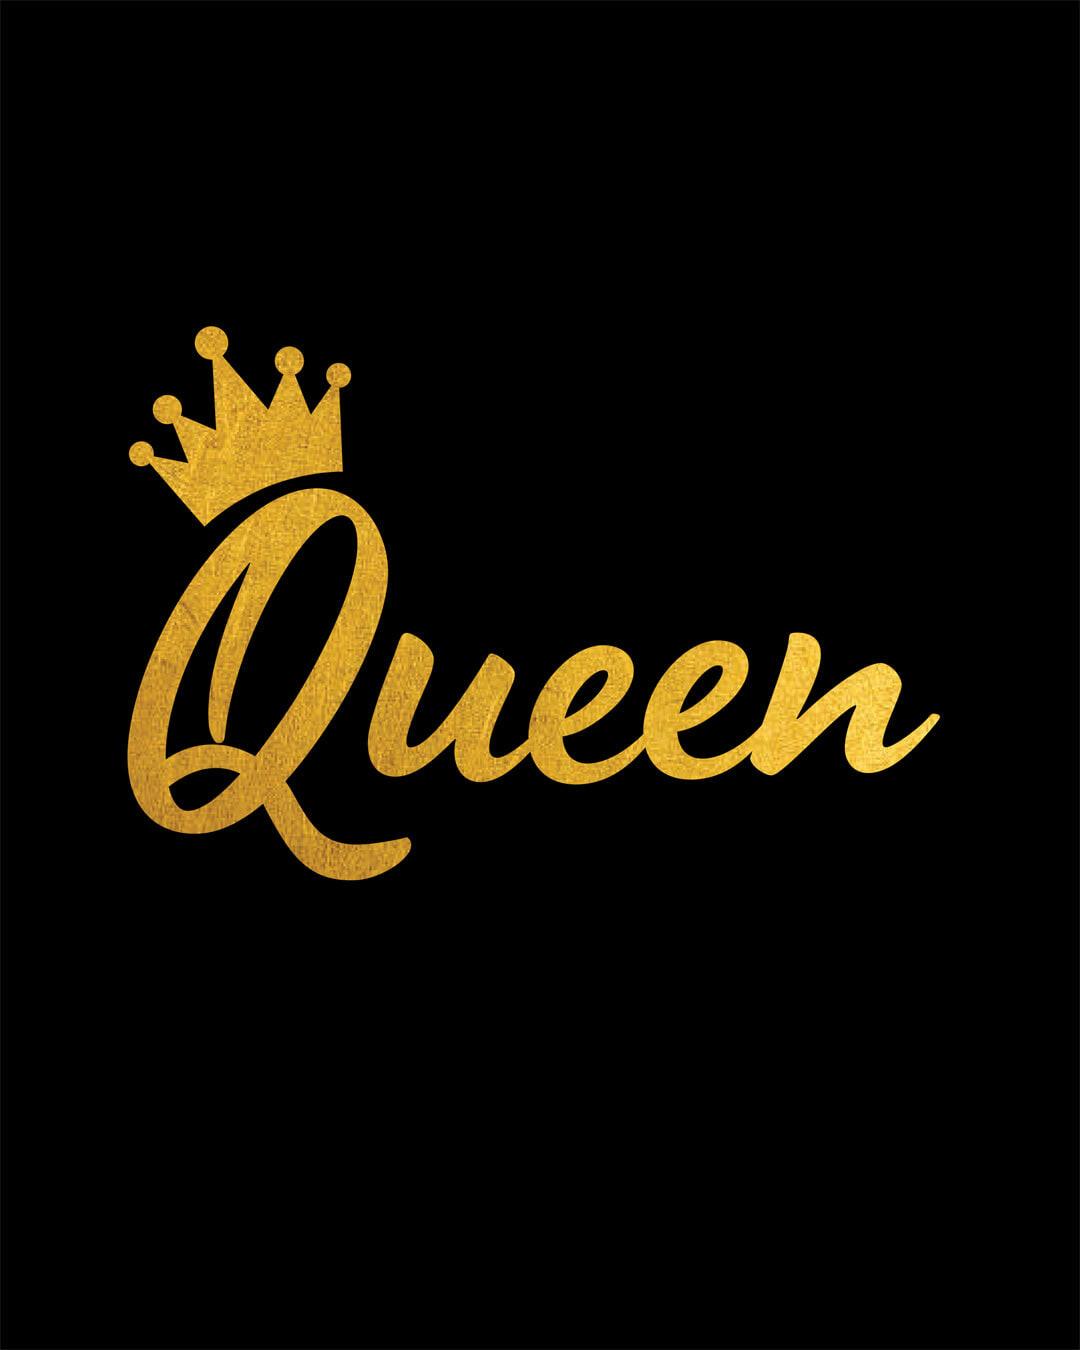 e9706df982 Buy Queen Gold Print Black Printed 3/4 Sleeve T-Shirt For Women Online  India @ Bewakoof.com